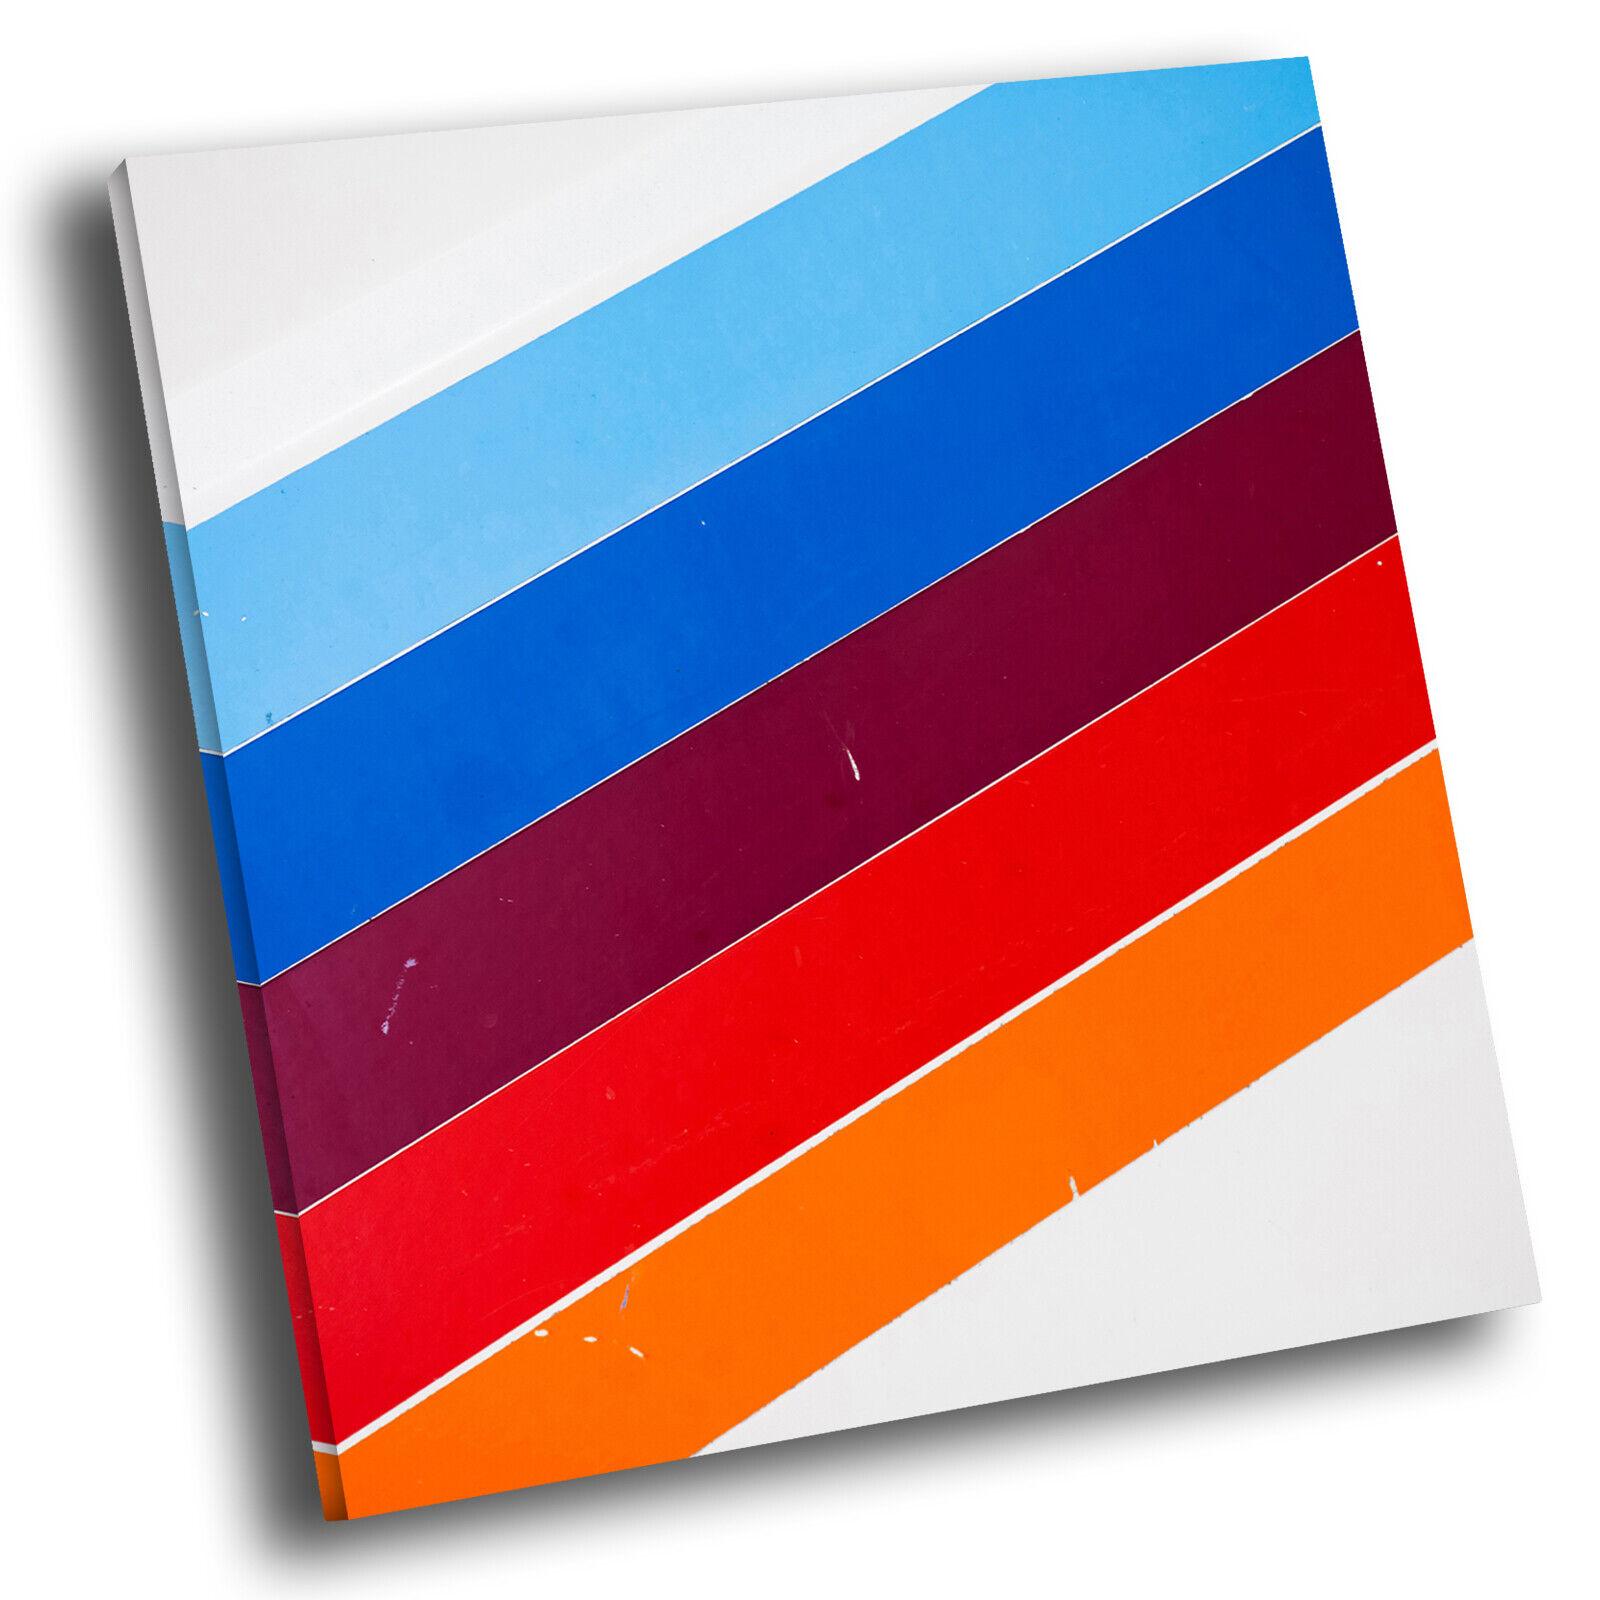 Blau lila Orange Stripe Square Abstract Canvas Wand Kunst Large Bild Druckens